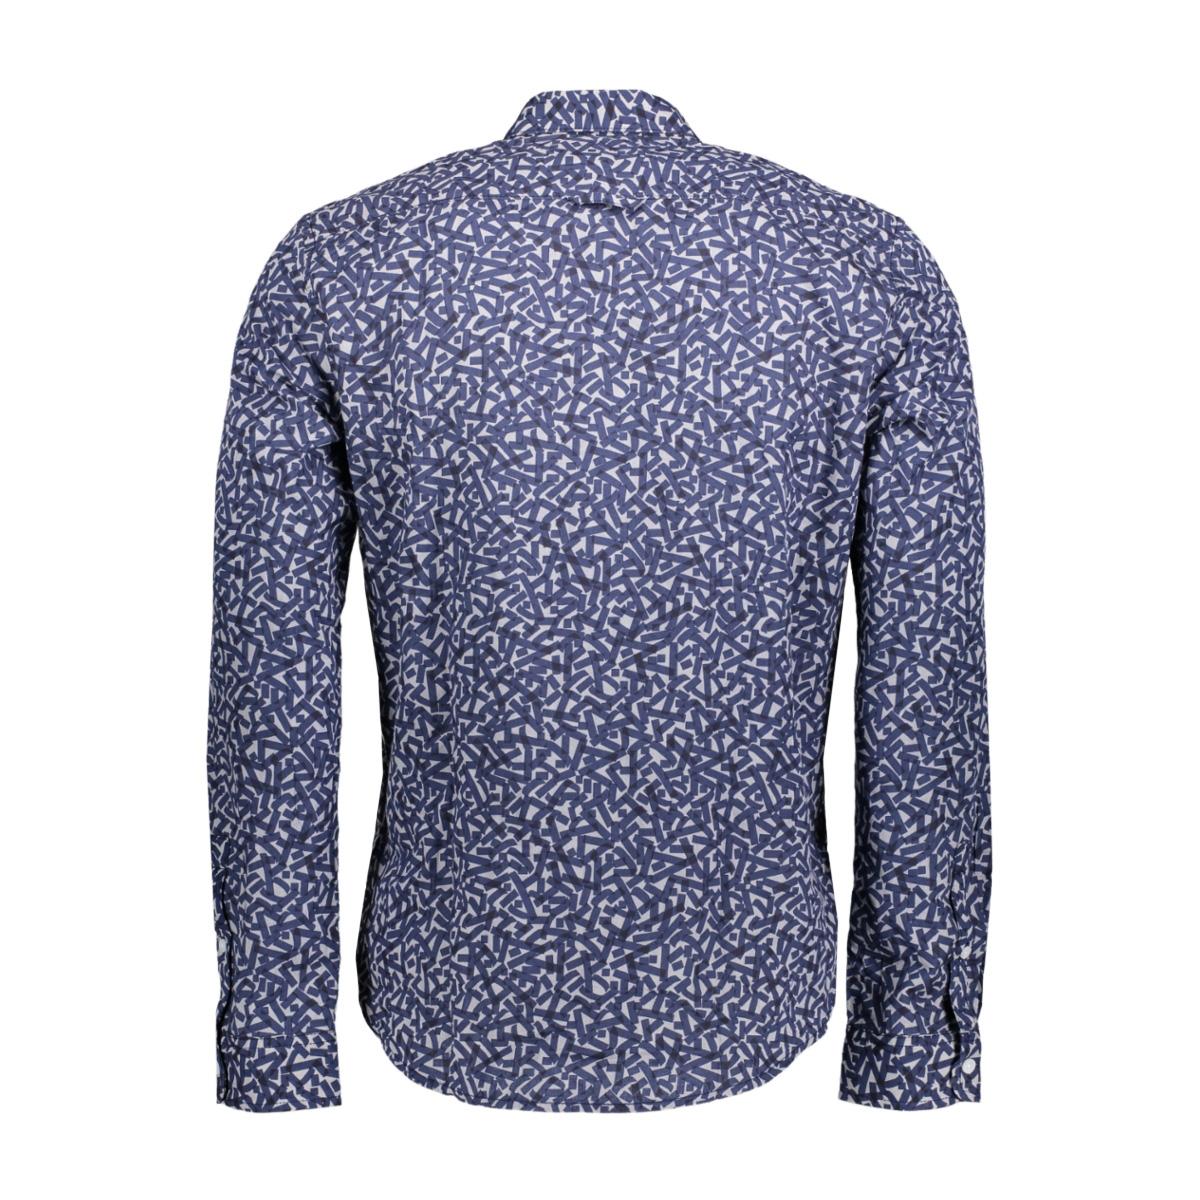 2055101.00.12 tom tailor overhemd 6576